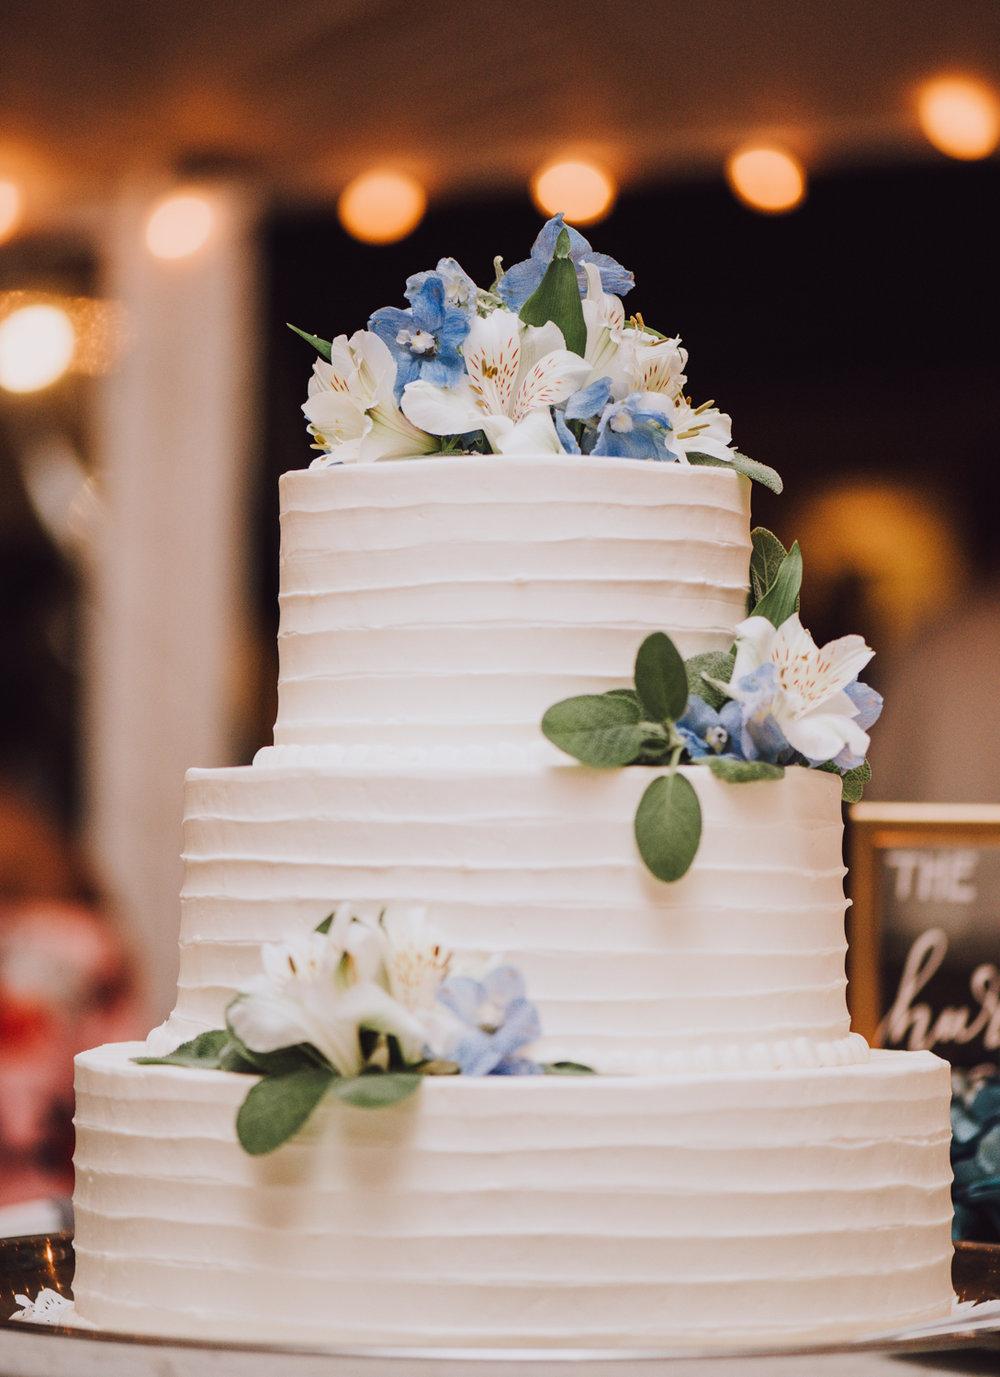 maureen_evan_wedding_wedding_cake_black_dog_bakery_marthas_vineyard-4316.jpg